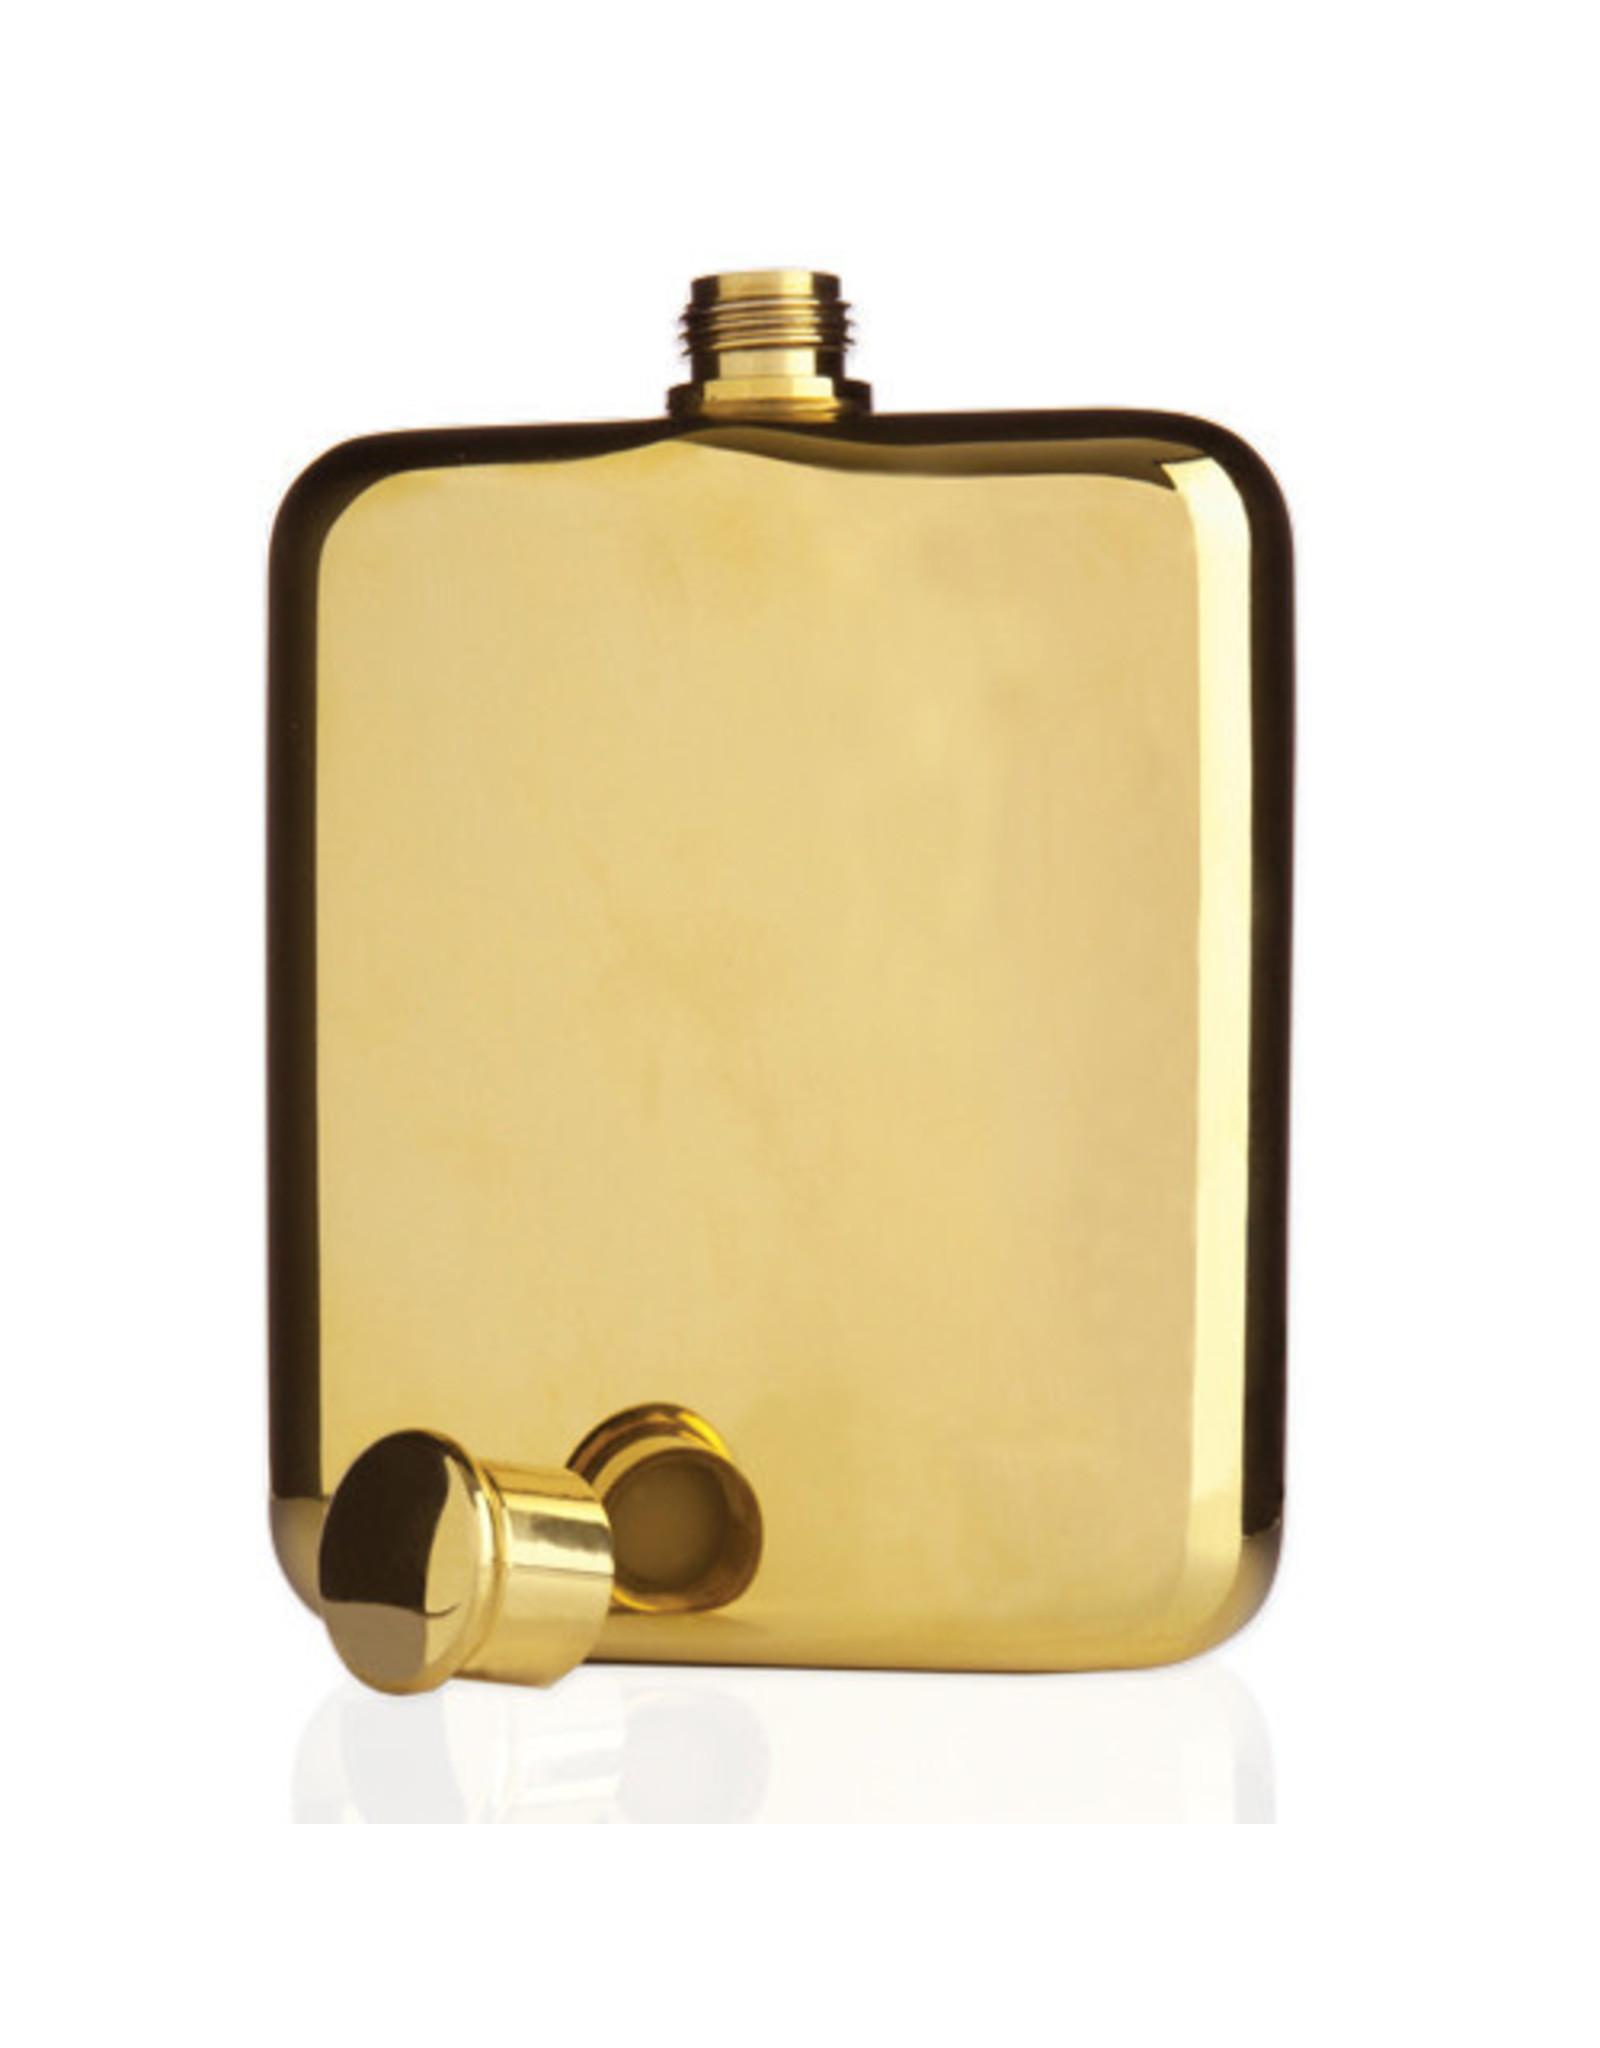 Viski Gold Plated Flask